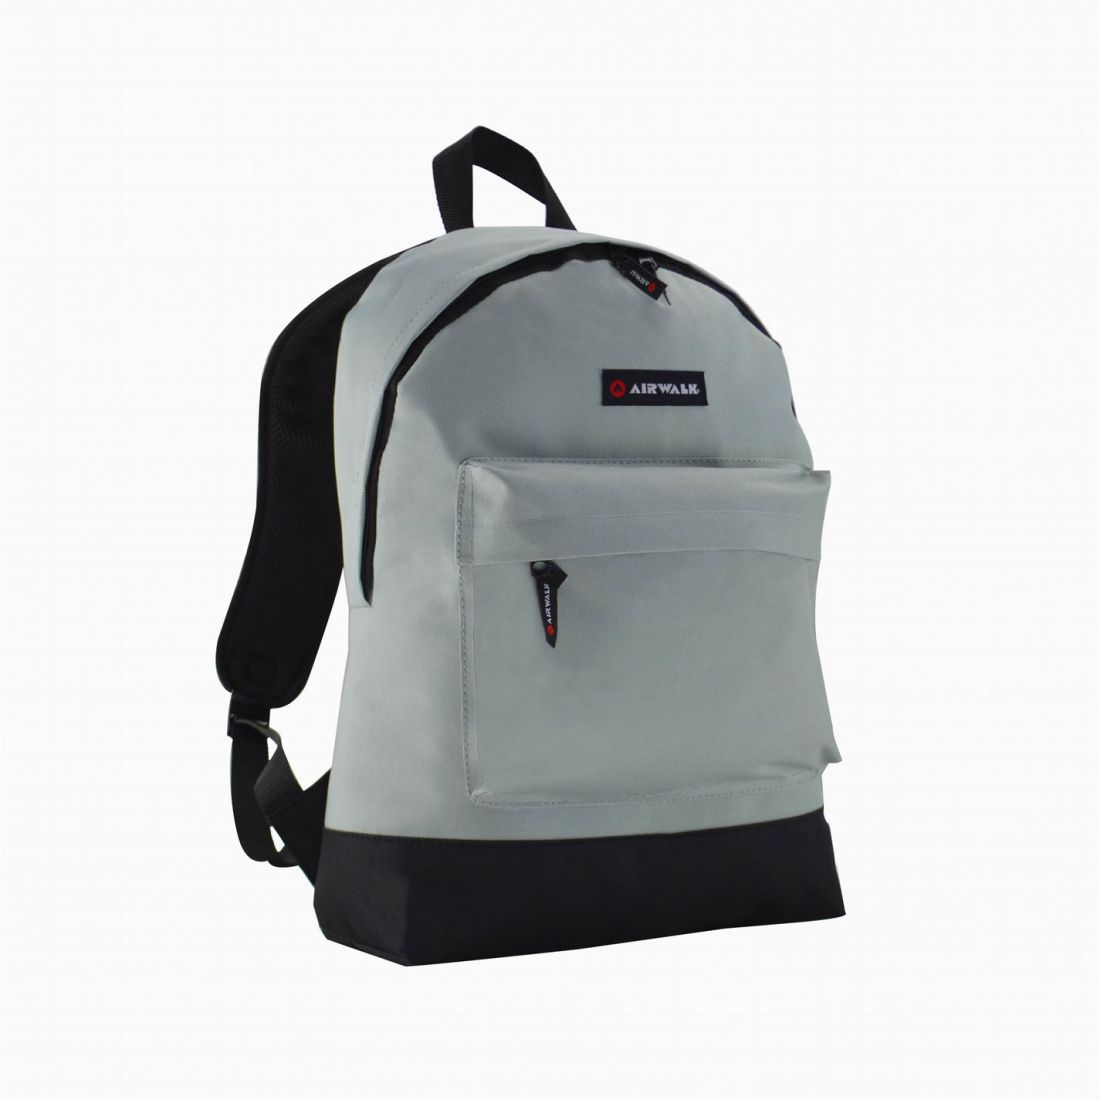 d8e7f1df53 Image is loading Airwalk-Essentials-Backpack-Unisex-Back-Pack-Zip